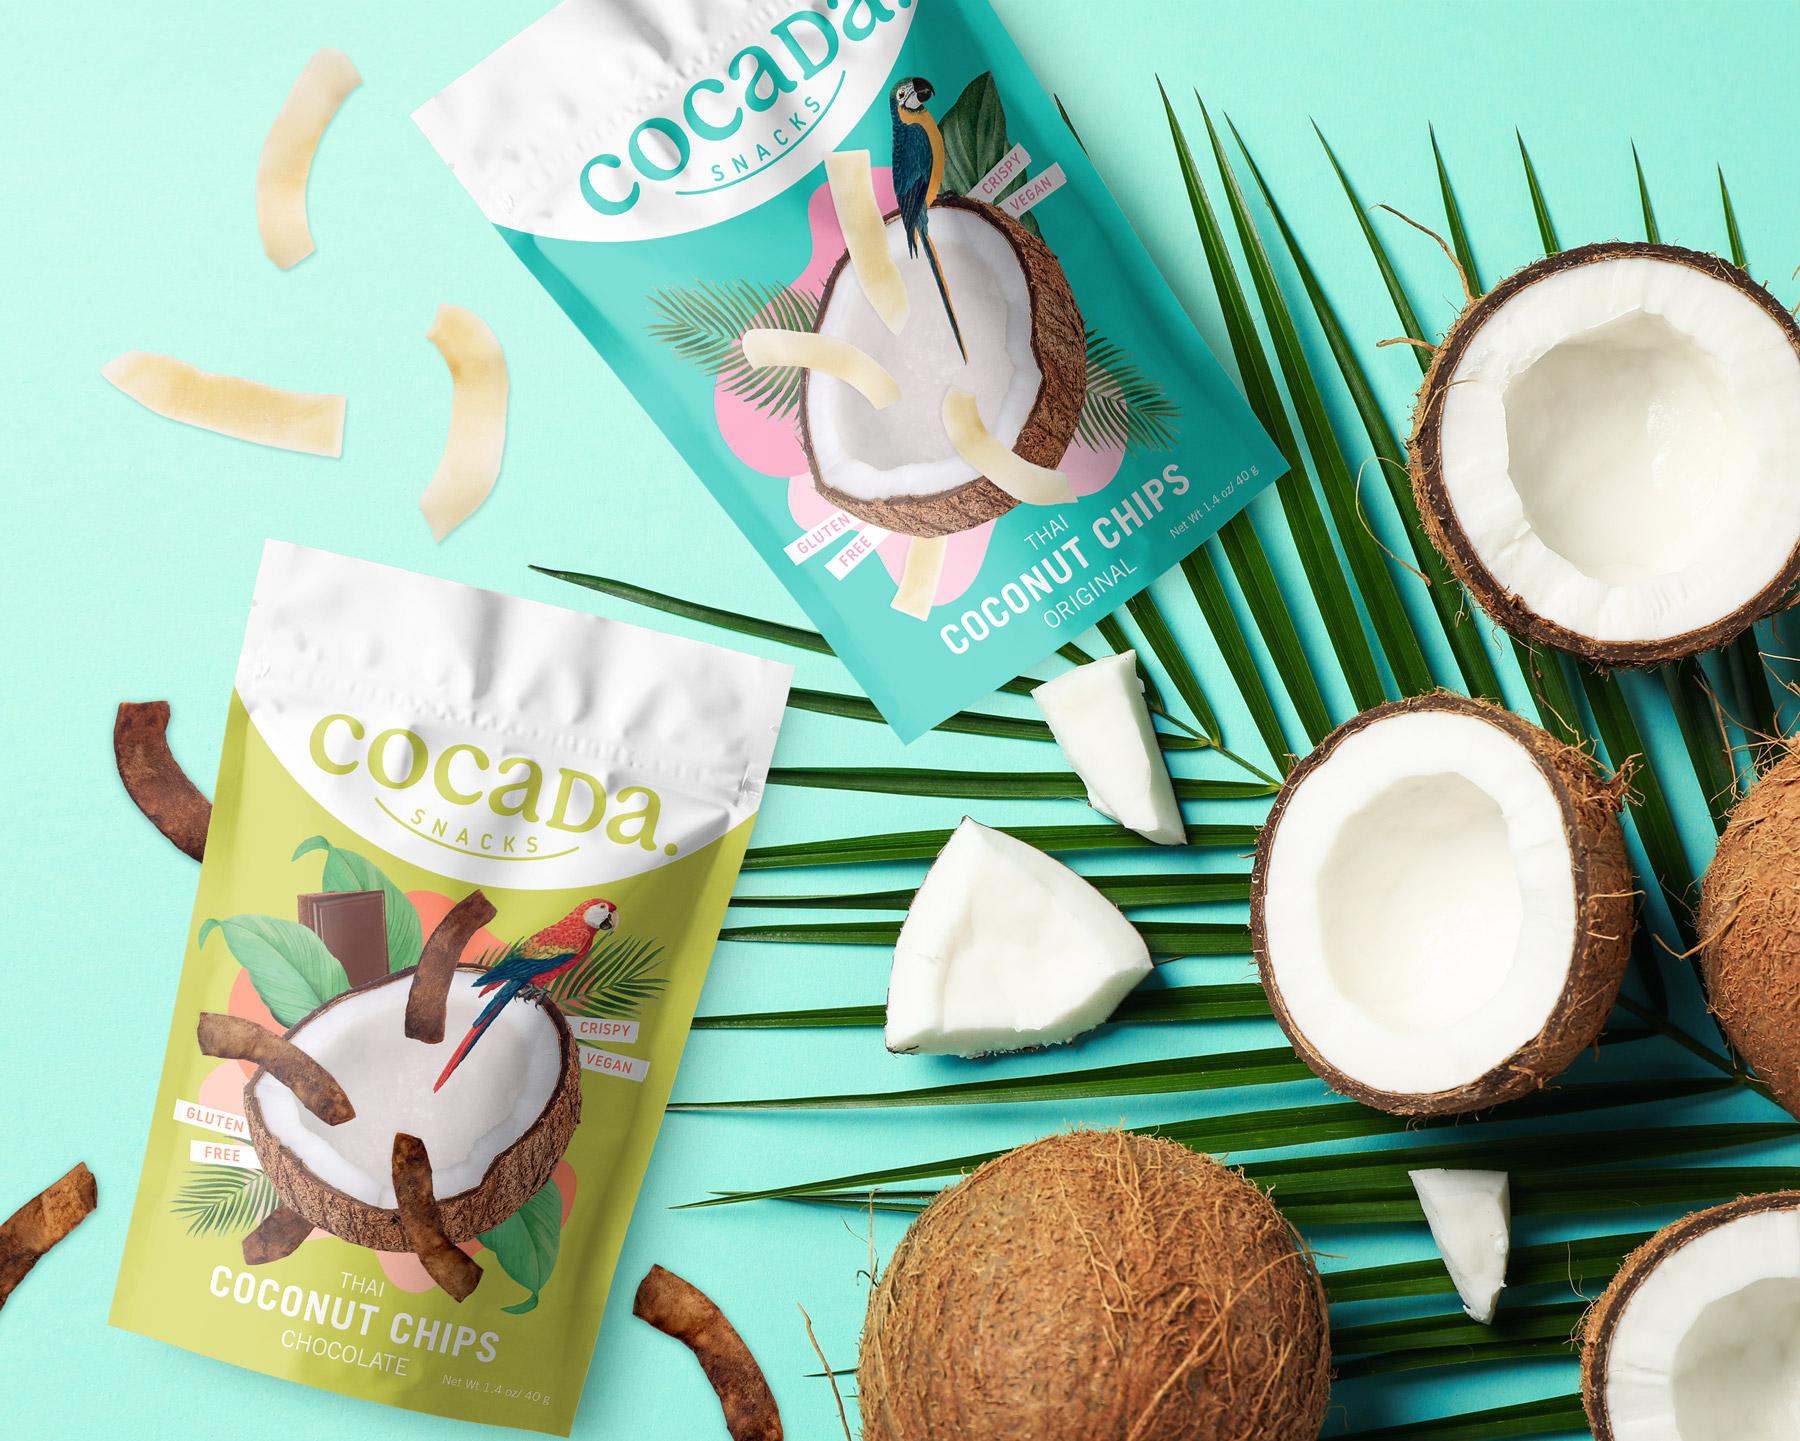 Mara Rodríguez Designs New Coconut Snacks Packaging for Cocada Snacks